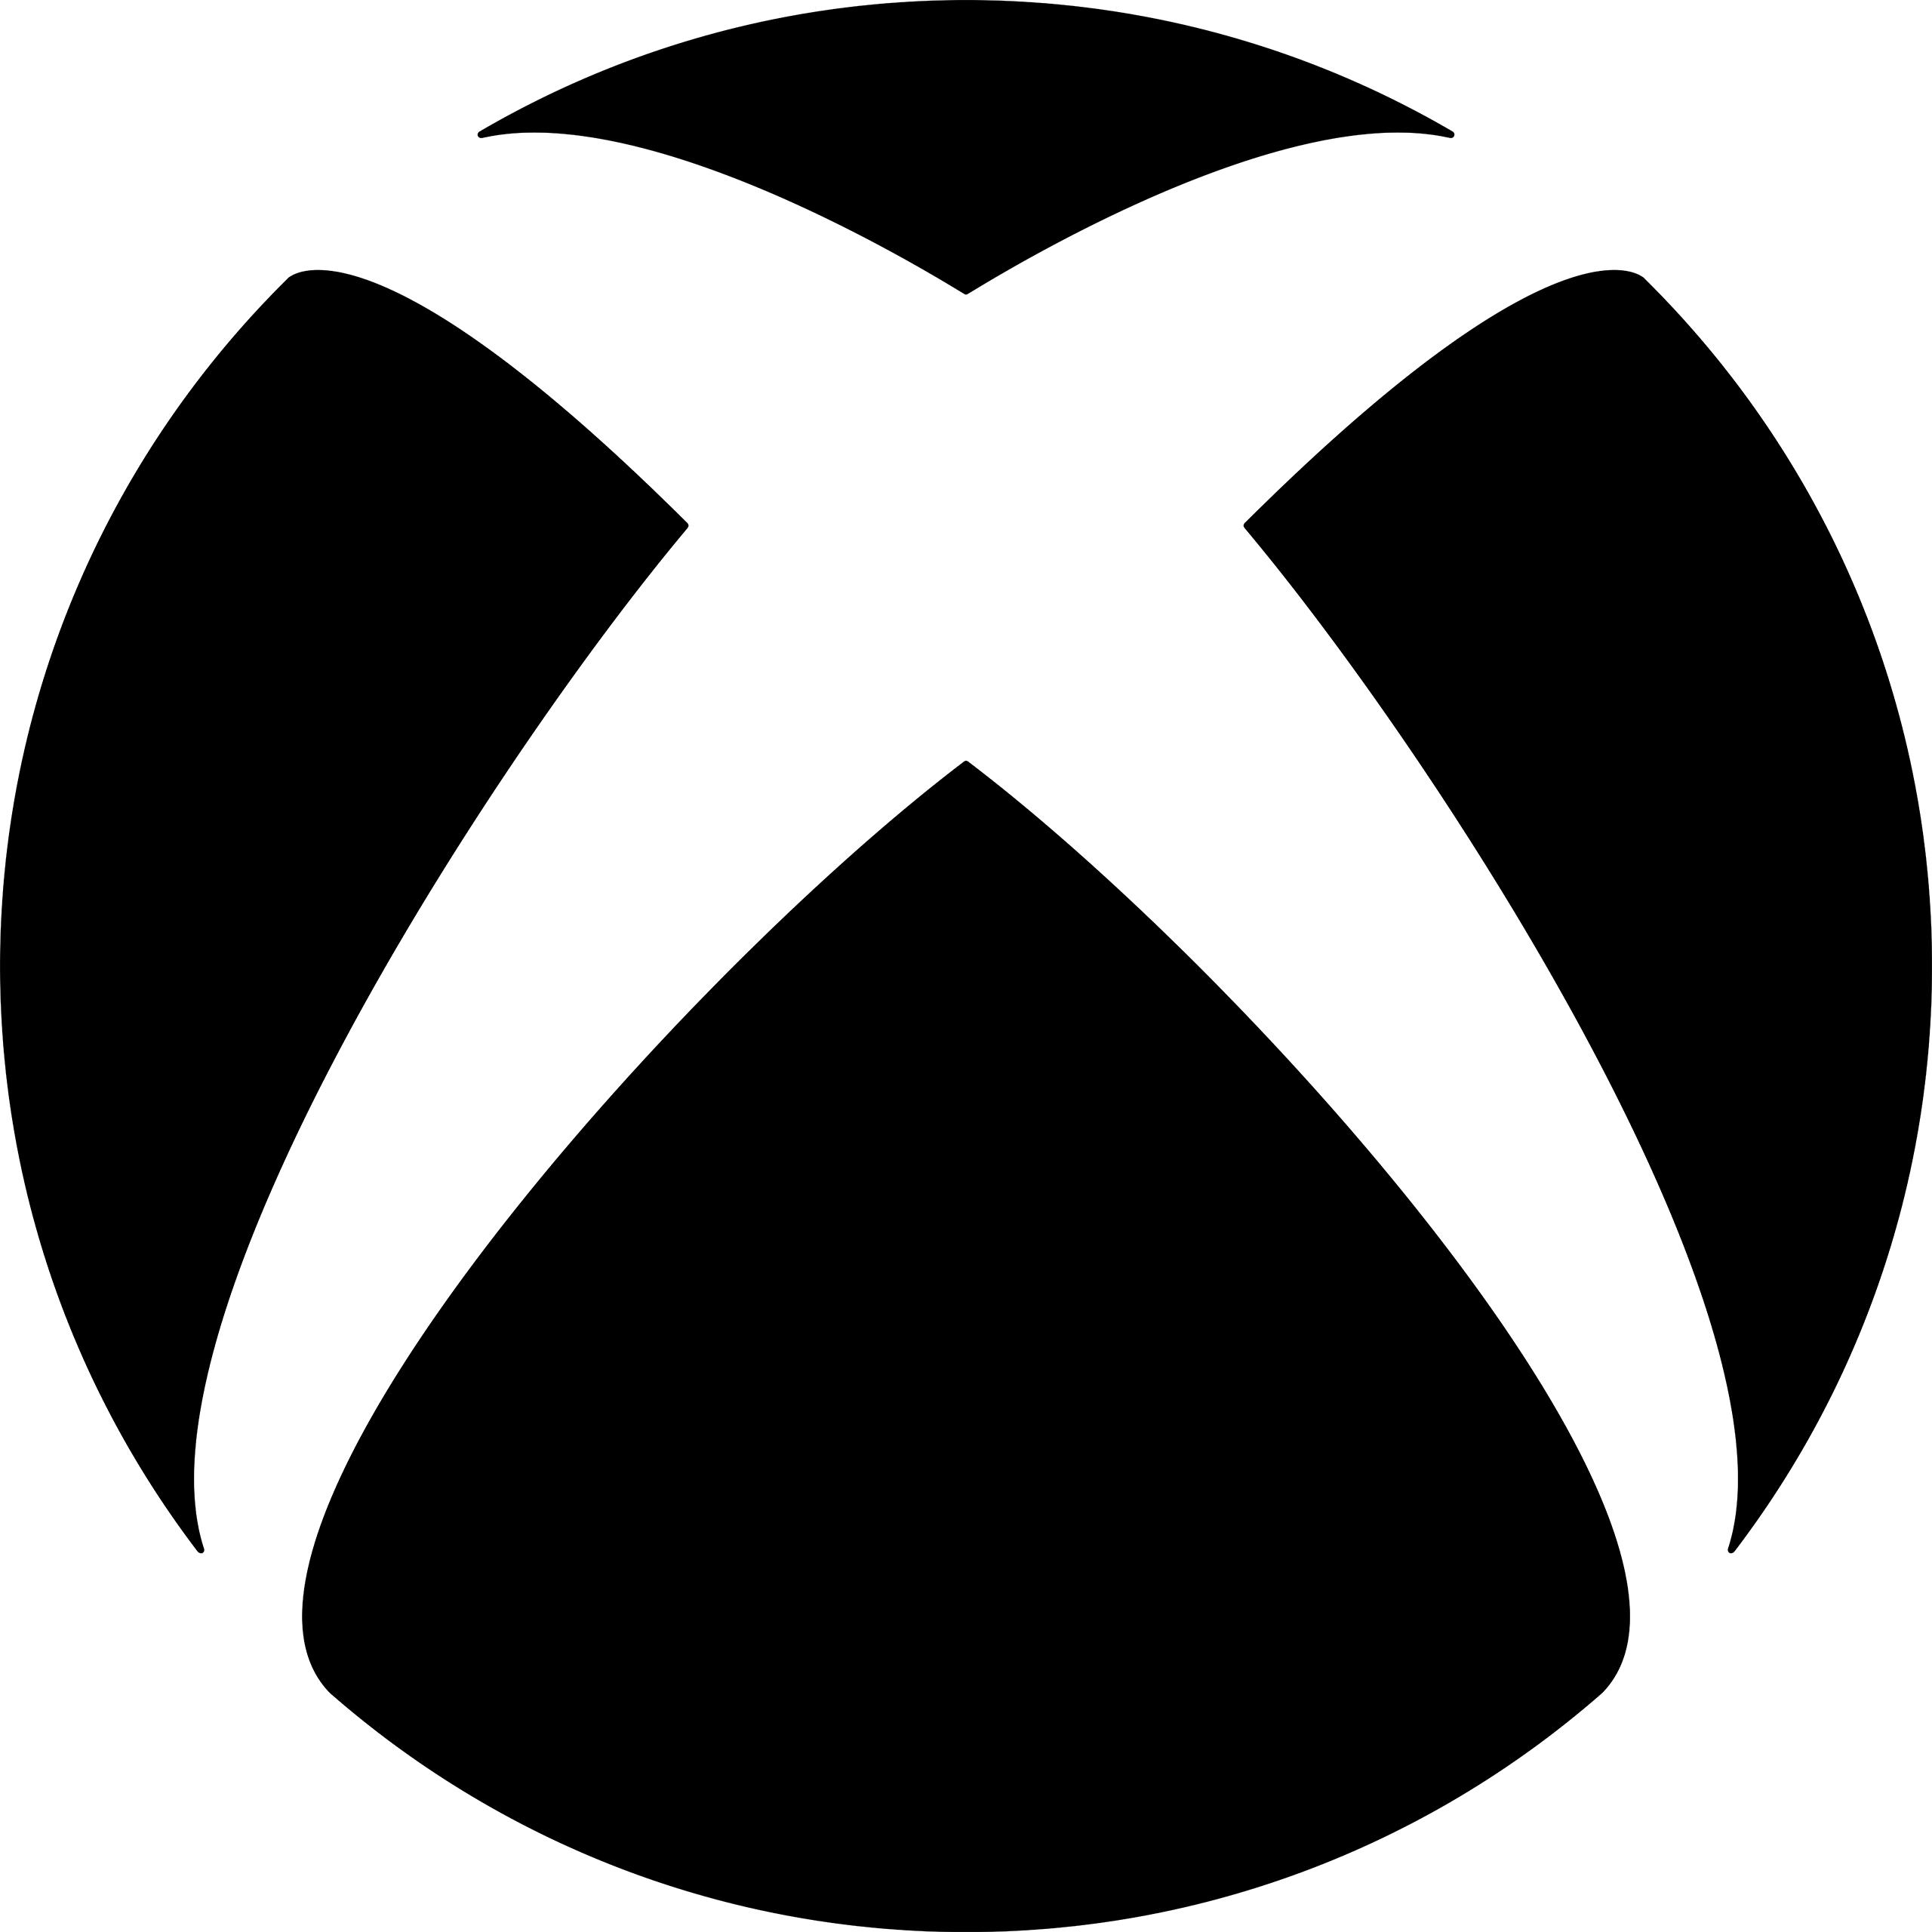 xbox games logo symbol #2500